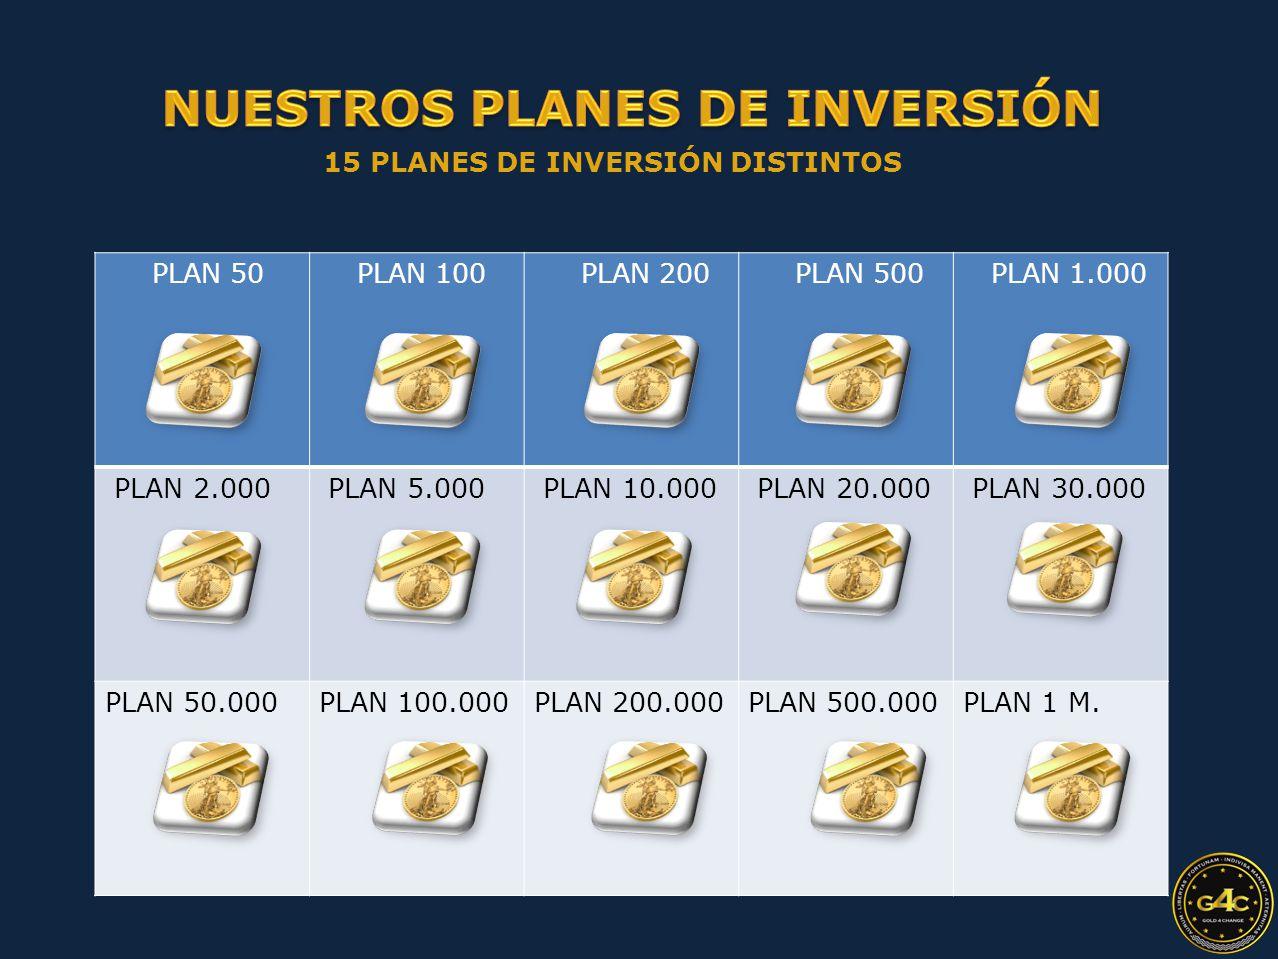 15 PLANES DE INVERSIÓN DISTINTOS PLAN 50 PLAN 100 PLAN 200 PLAN 500 PLAN 1.000 PLAN 2.000 PLAN 5.000 PLAN 10.000 PLAN 20.000 PLAN 30.000 PLAN 50.000PLAN 100.000PLAN 200.000PLAN 500.000PLAN 1 M.